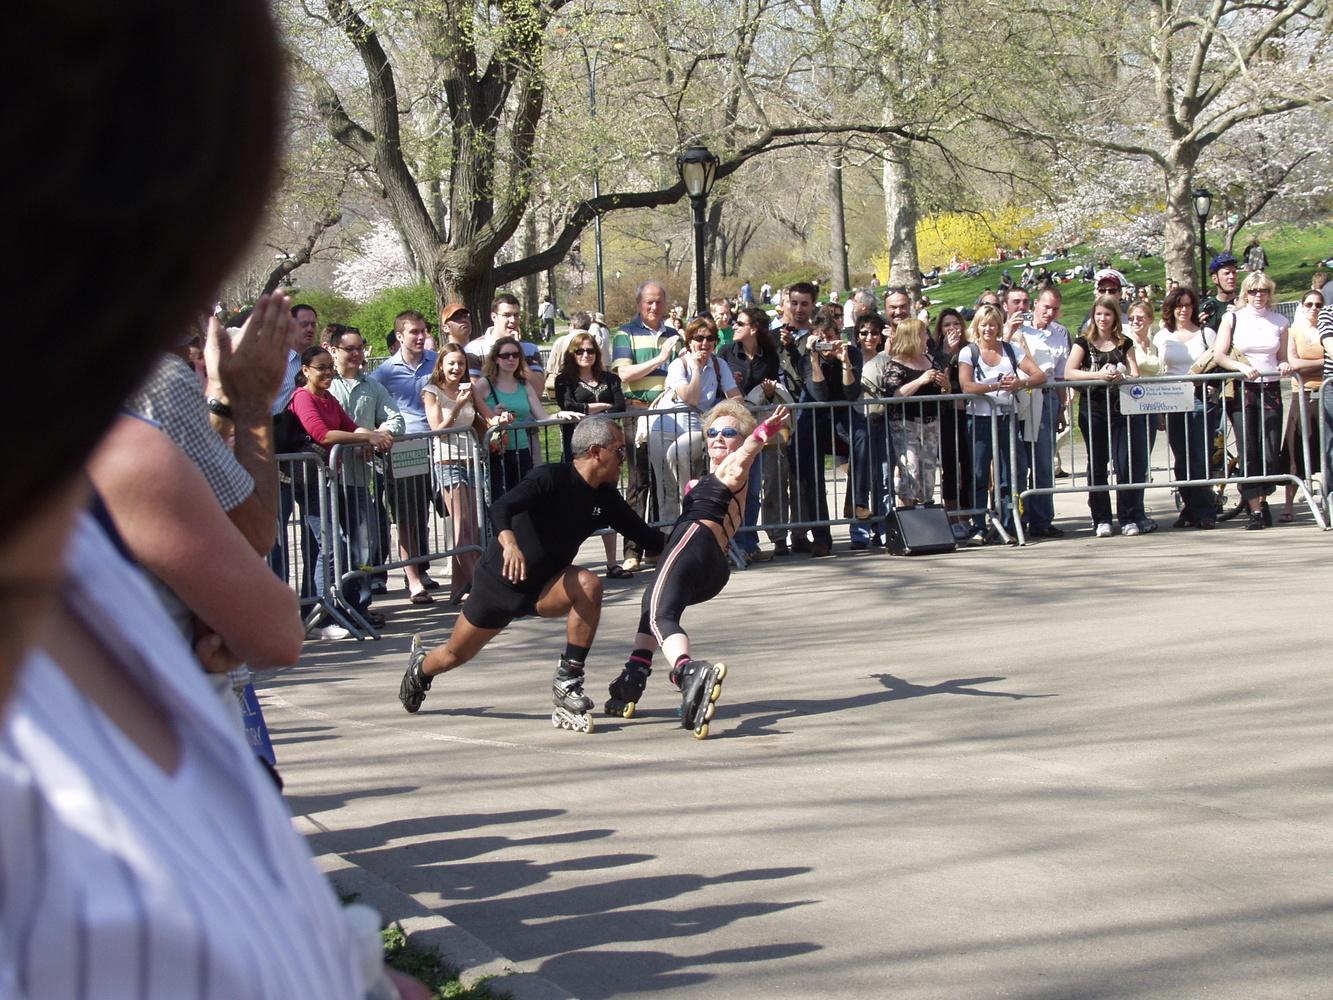 NYC Skaters by EJ Steele